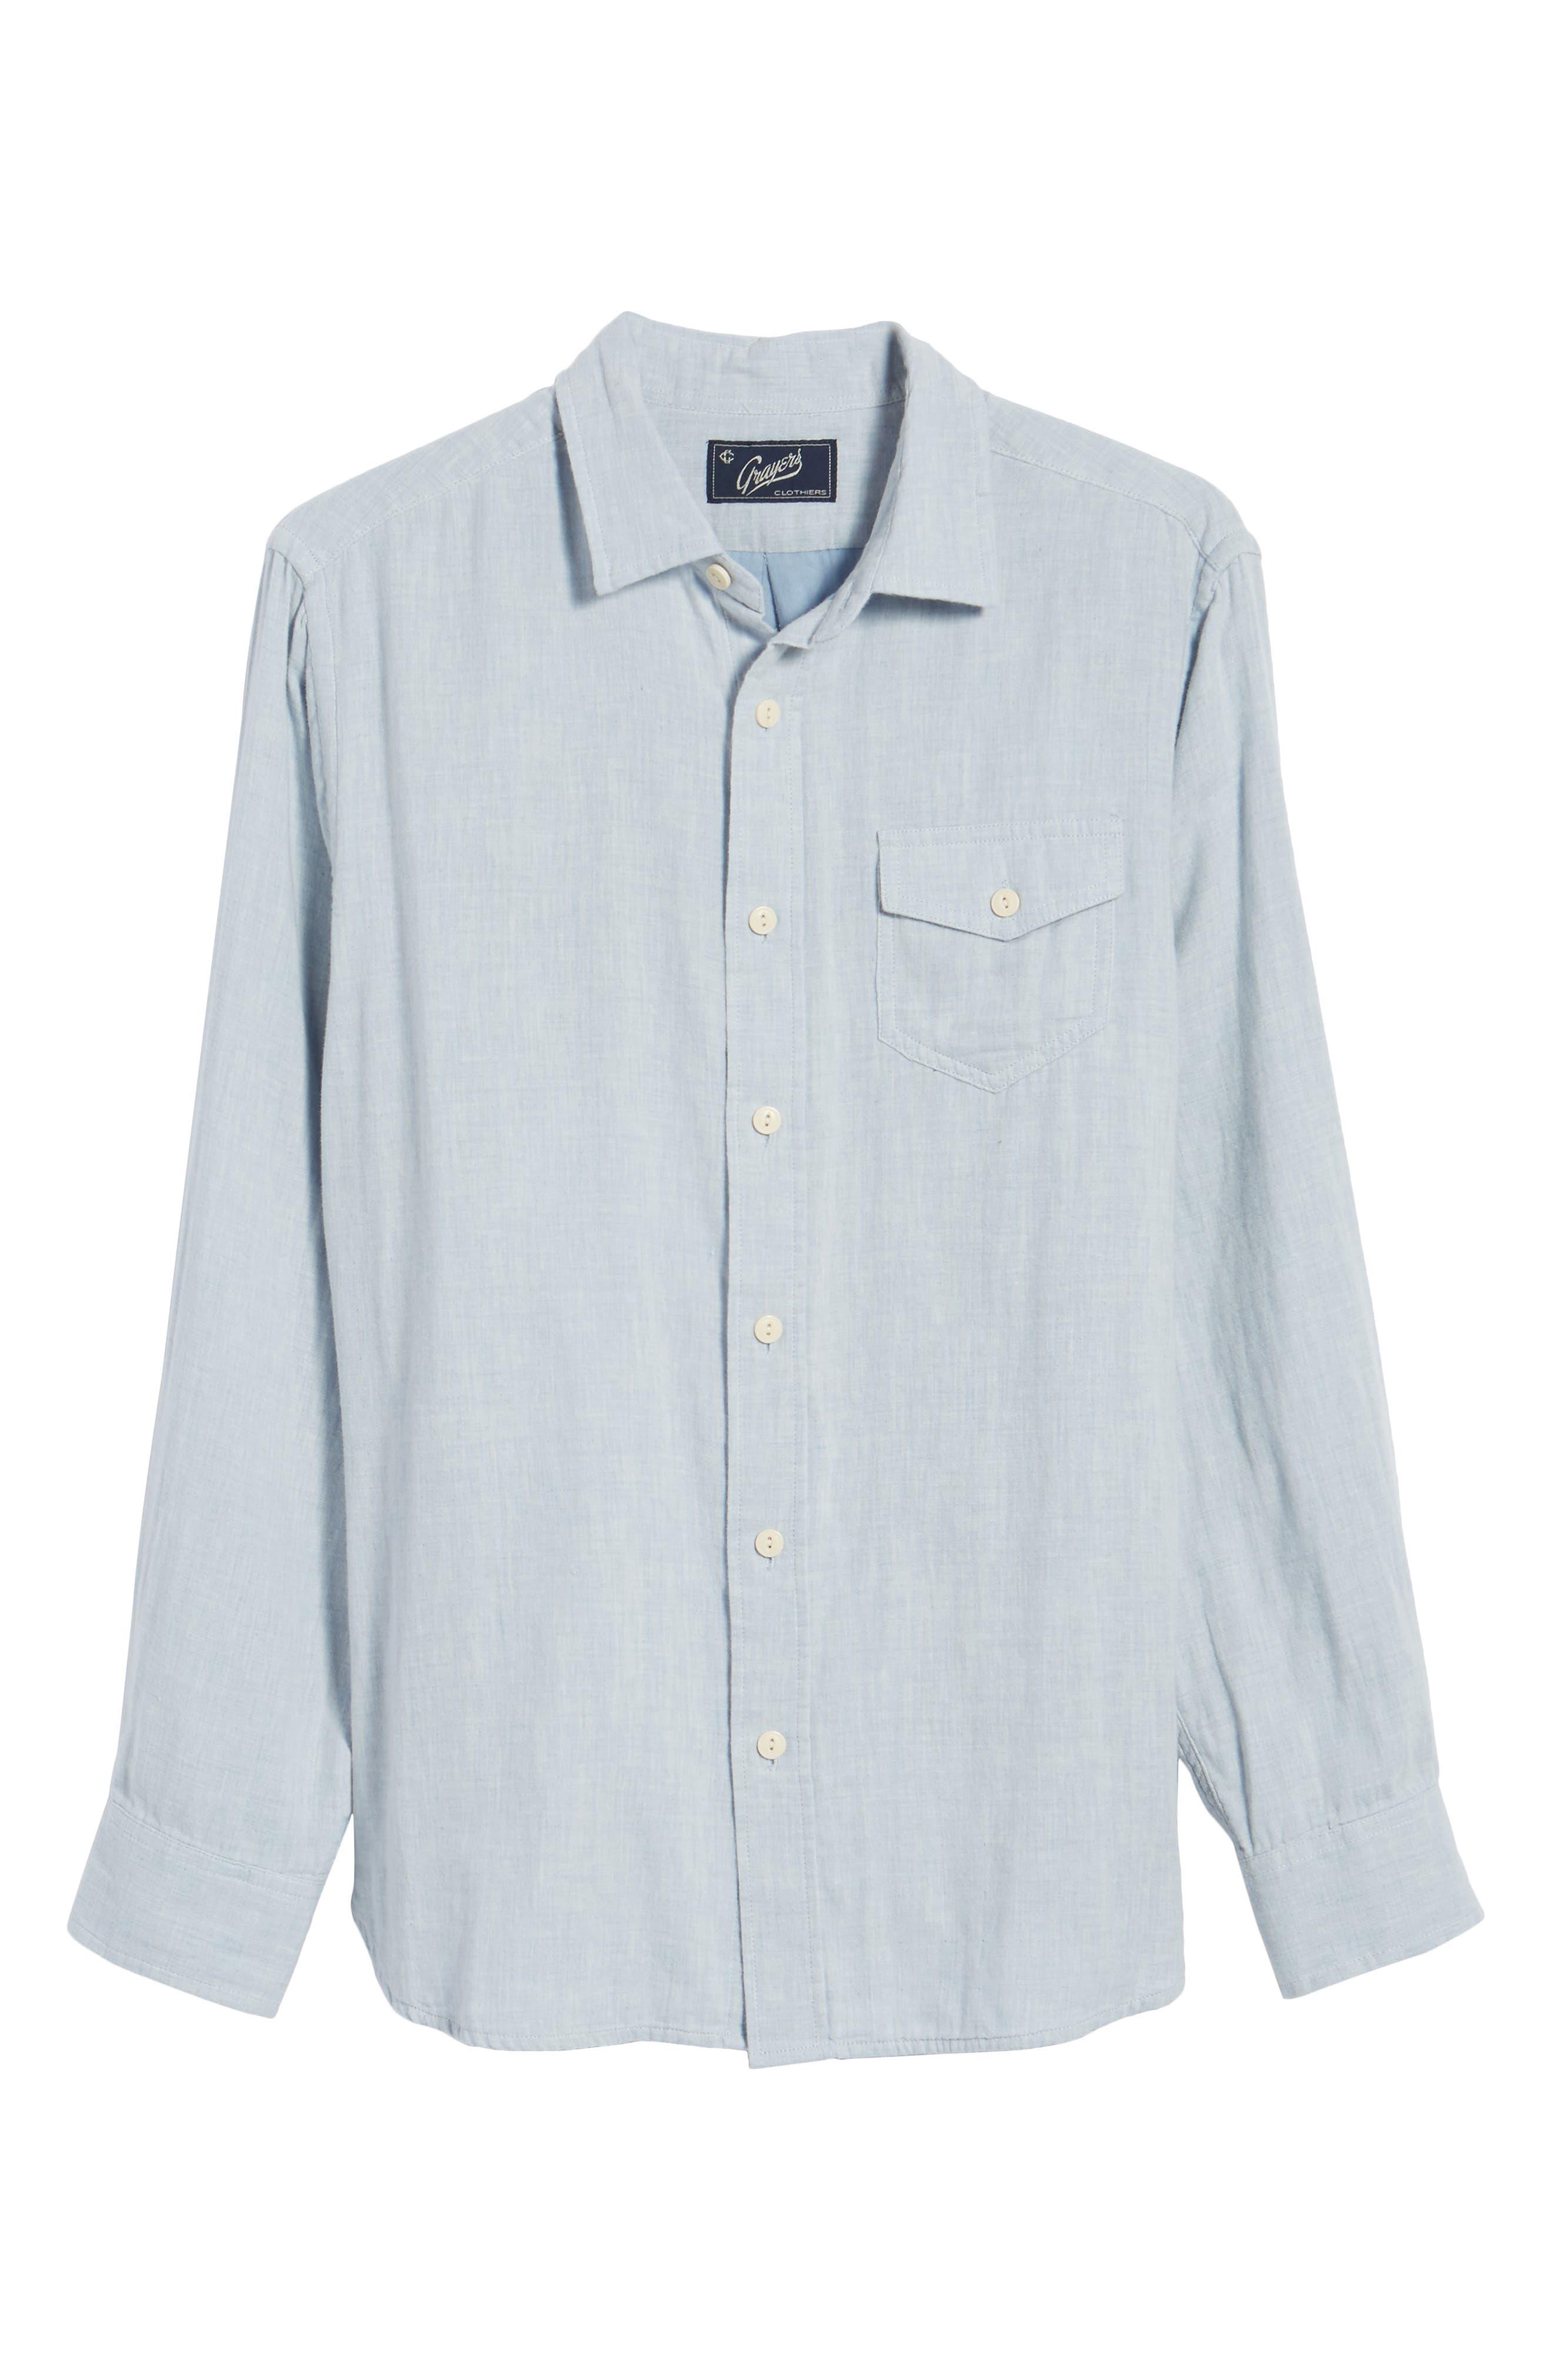 Hammond Slim Fit Sport Shirt,                             Alternate thumbnail 6, color,                             Light Blue Heather